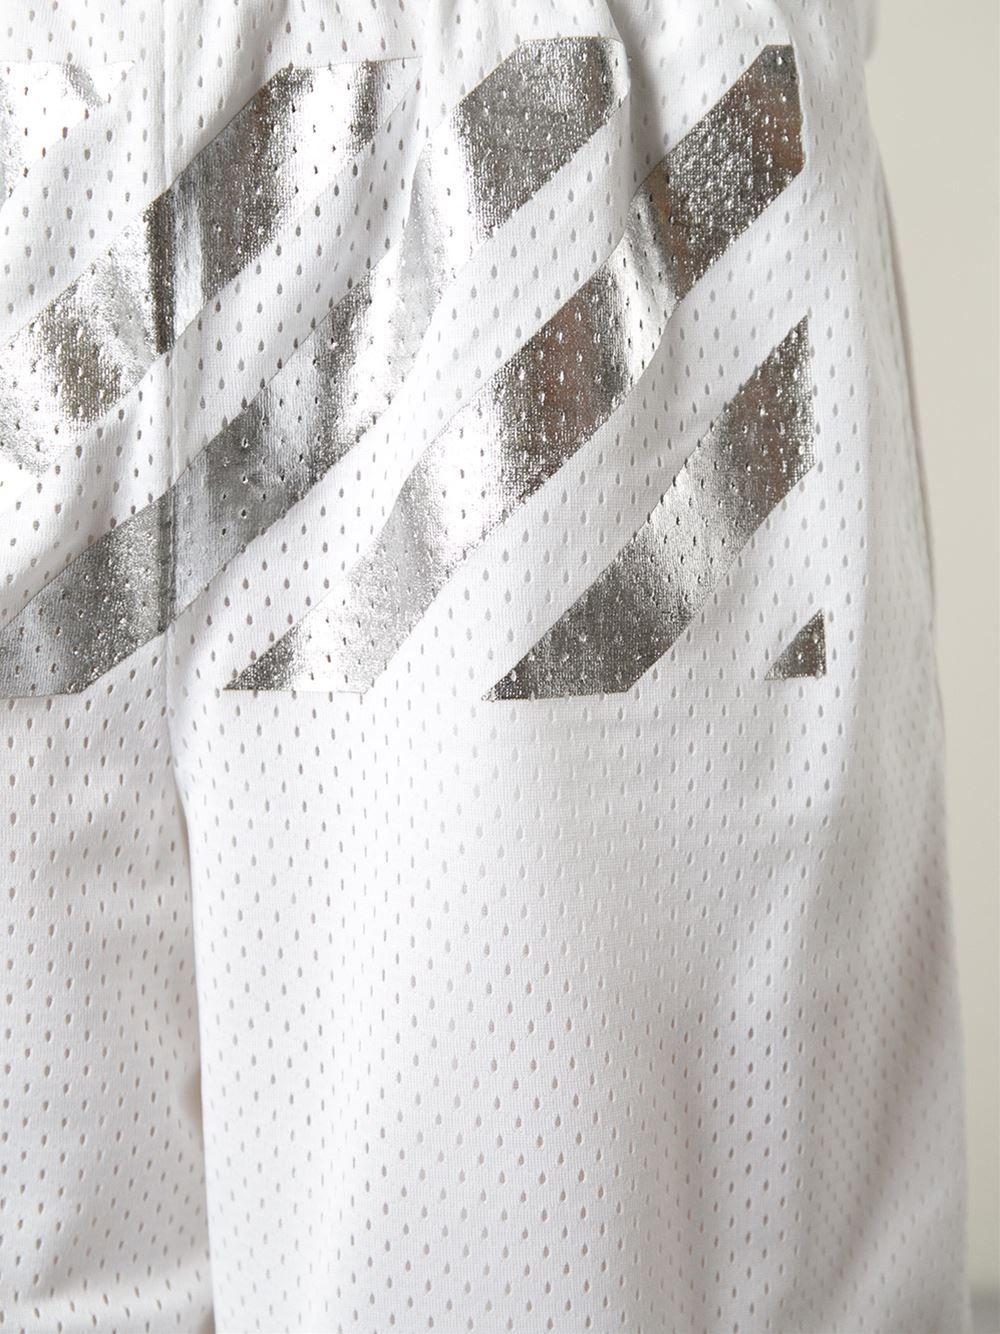 59de6a3e99c2 Off-white Metallic Stripe Perforated Track Shorts - Patron Of The New -  Farfetch.com